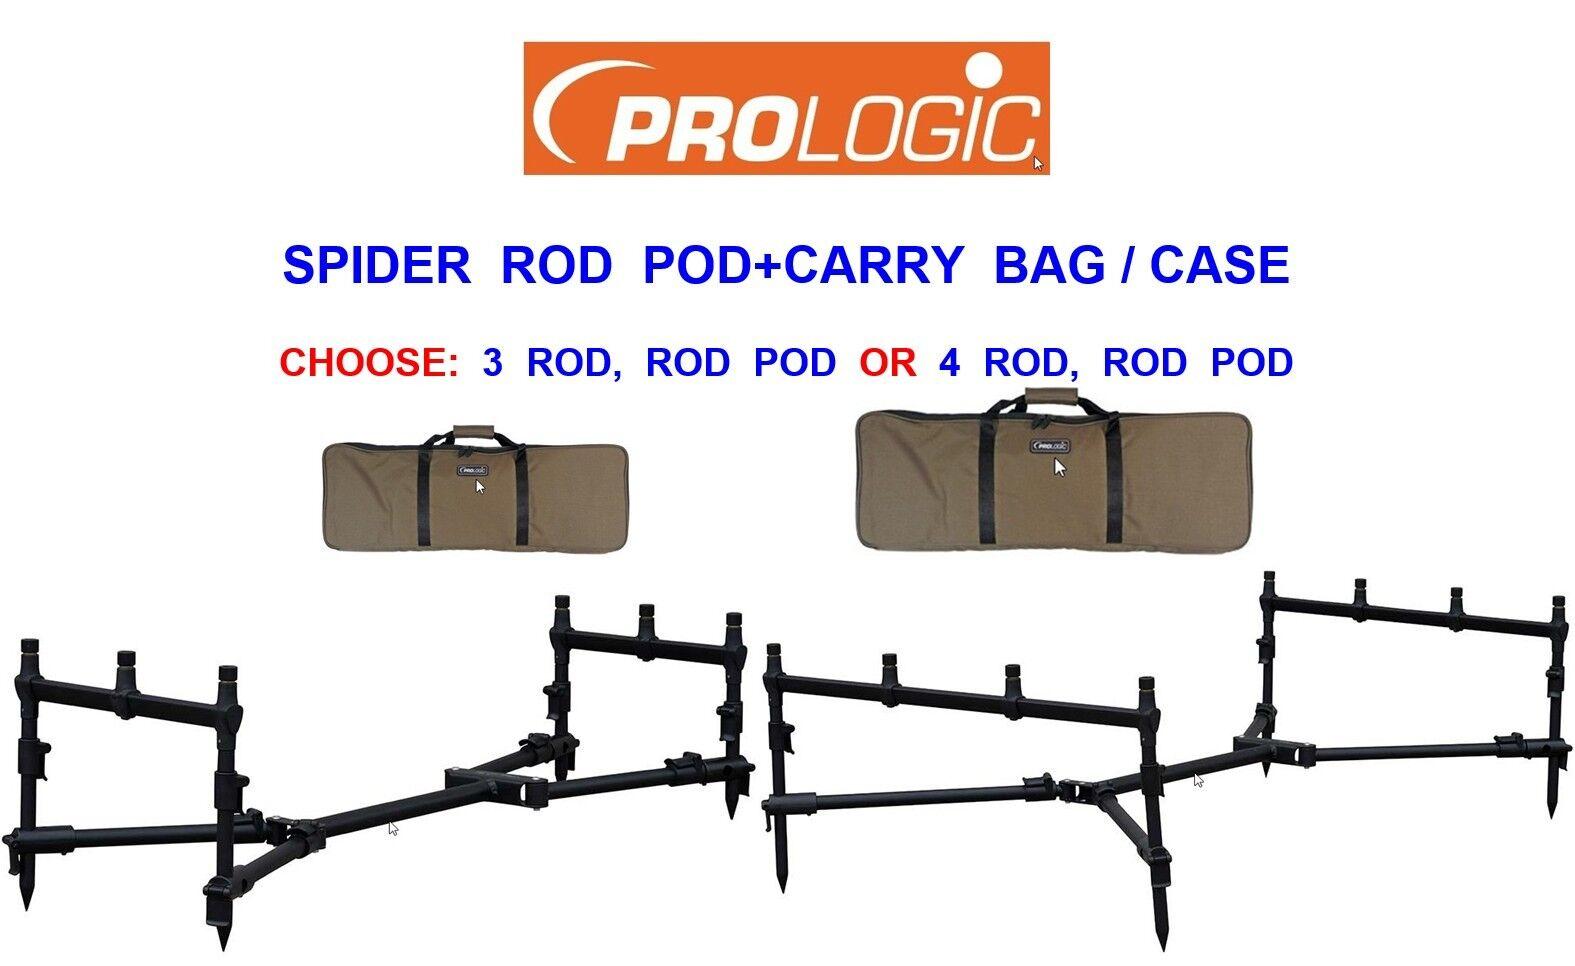 PROLOGIC SPIDER ROD POD+CASE BAG FOR CARP FISHING 3 4 GOAL POST BITE ALARM SET